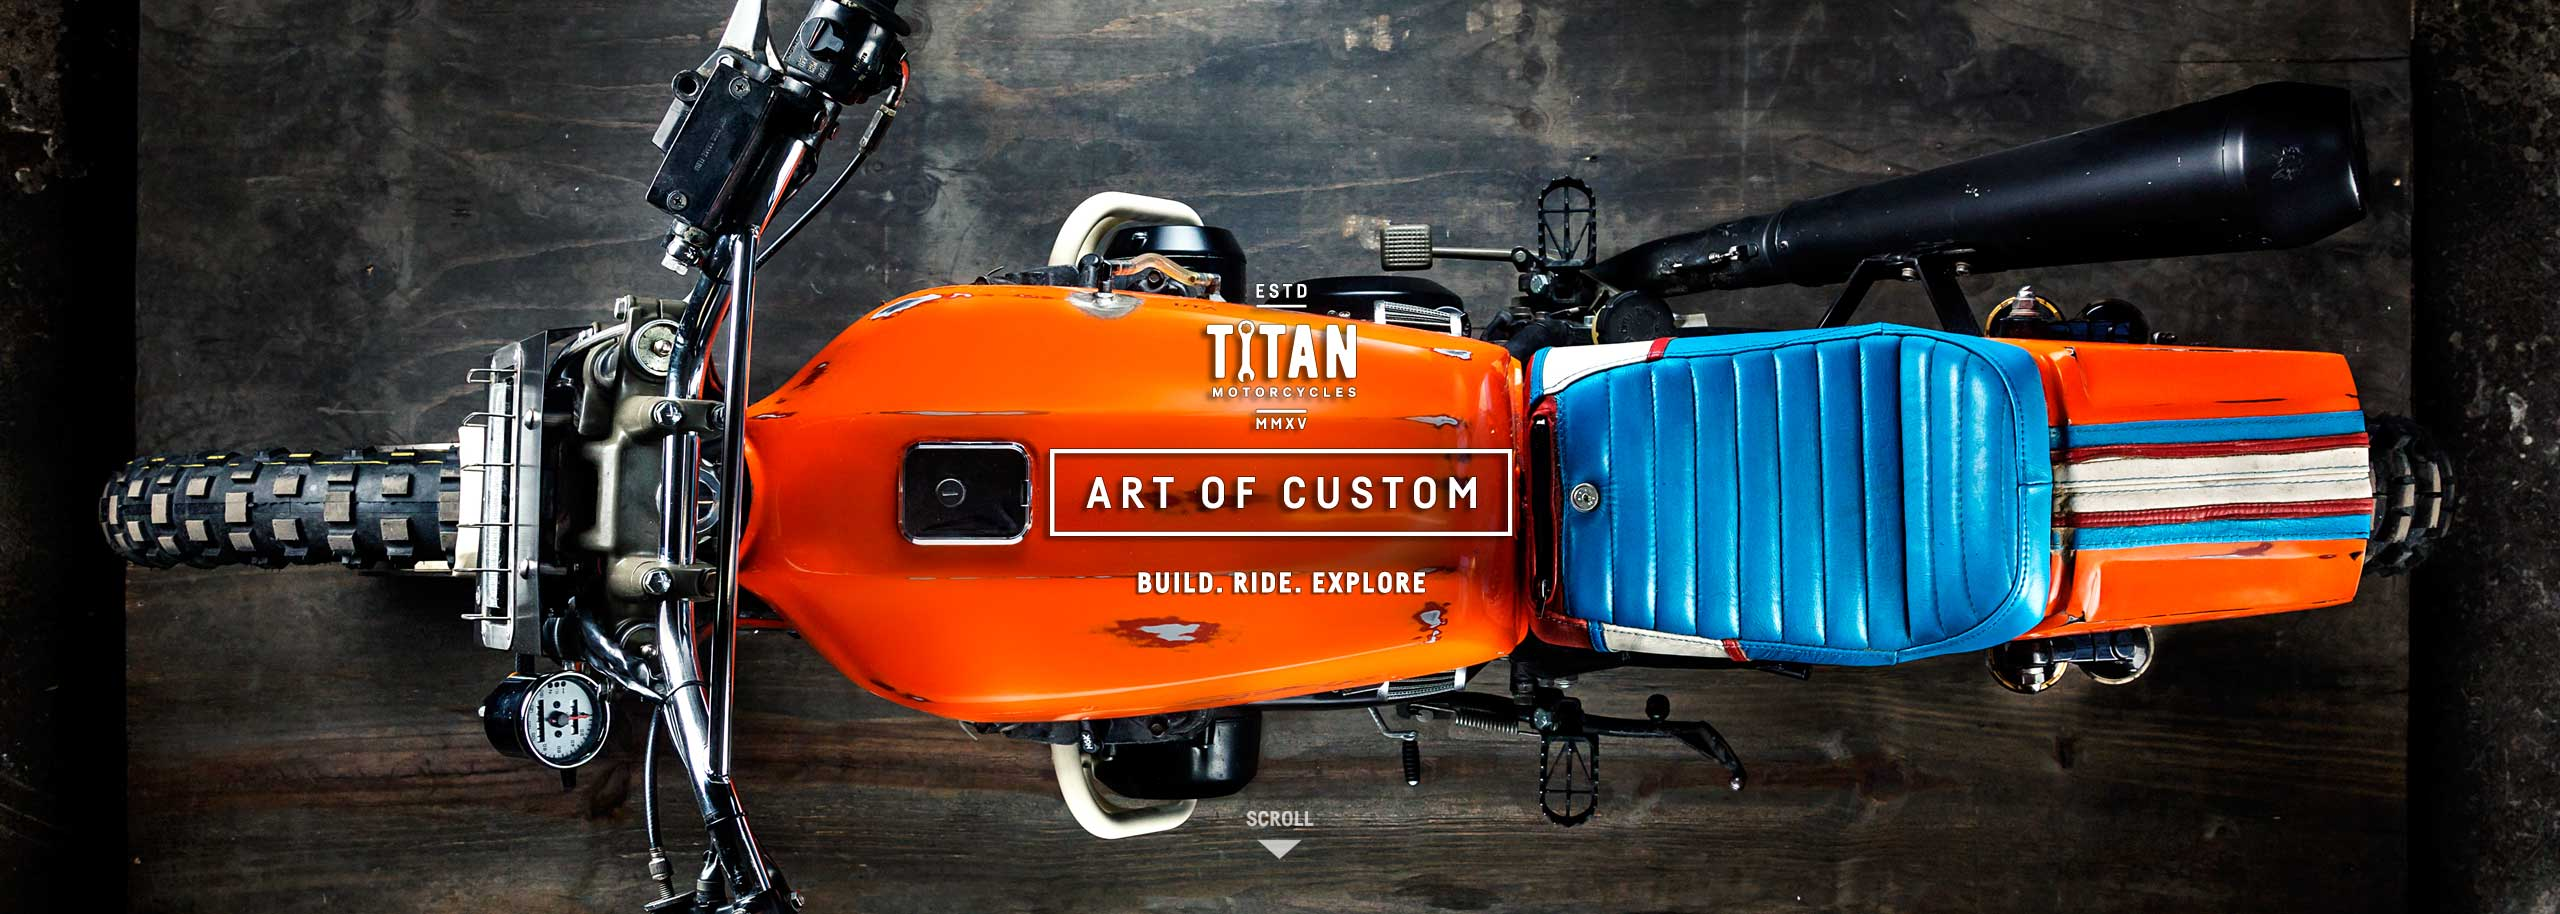 01_Cafe-Racer-Graz-BMW-Umbau-Honda-Steiermark-Kawasaki-Z500-Custom-Bike-The-Beast-Snowboard-Bike-Lifestyle-Tüv-Typisierung-Styrian-Motorcycles_Creative-Industrial-Design-Handmade.jpg